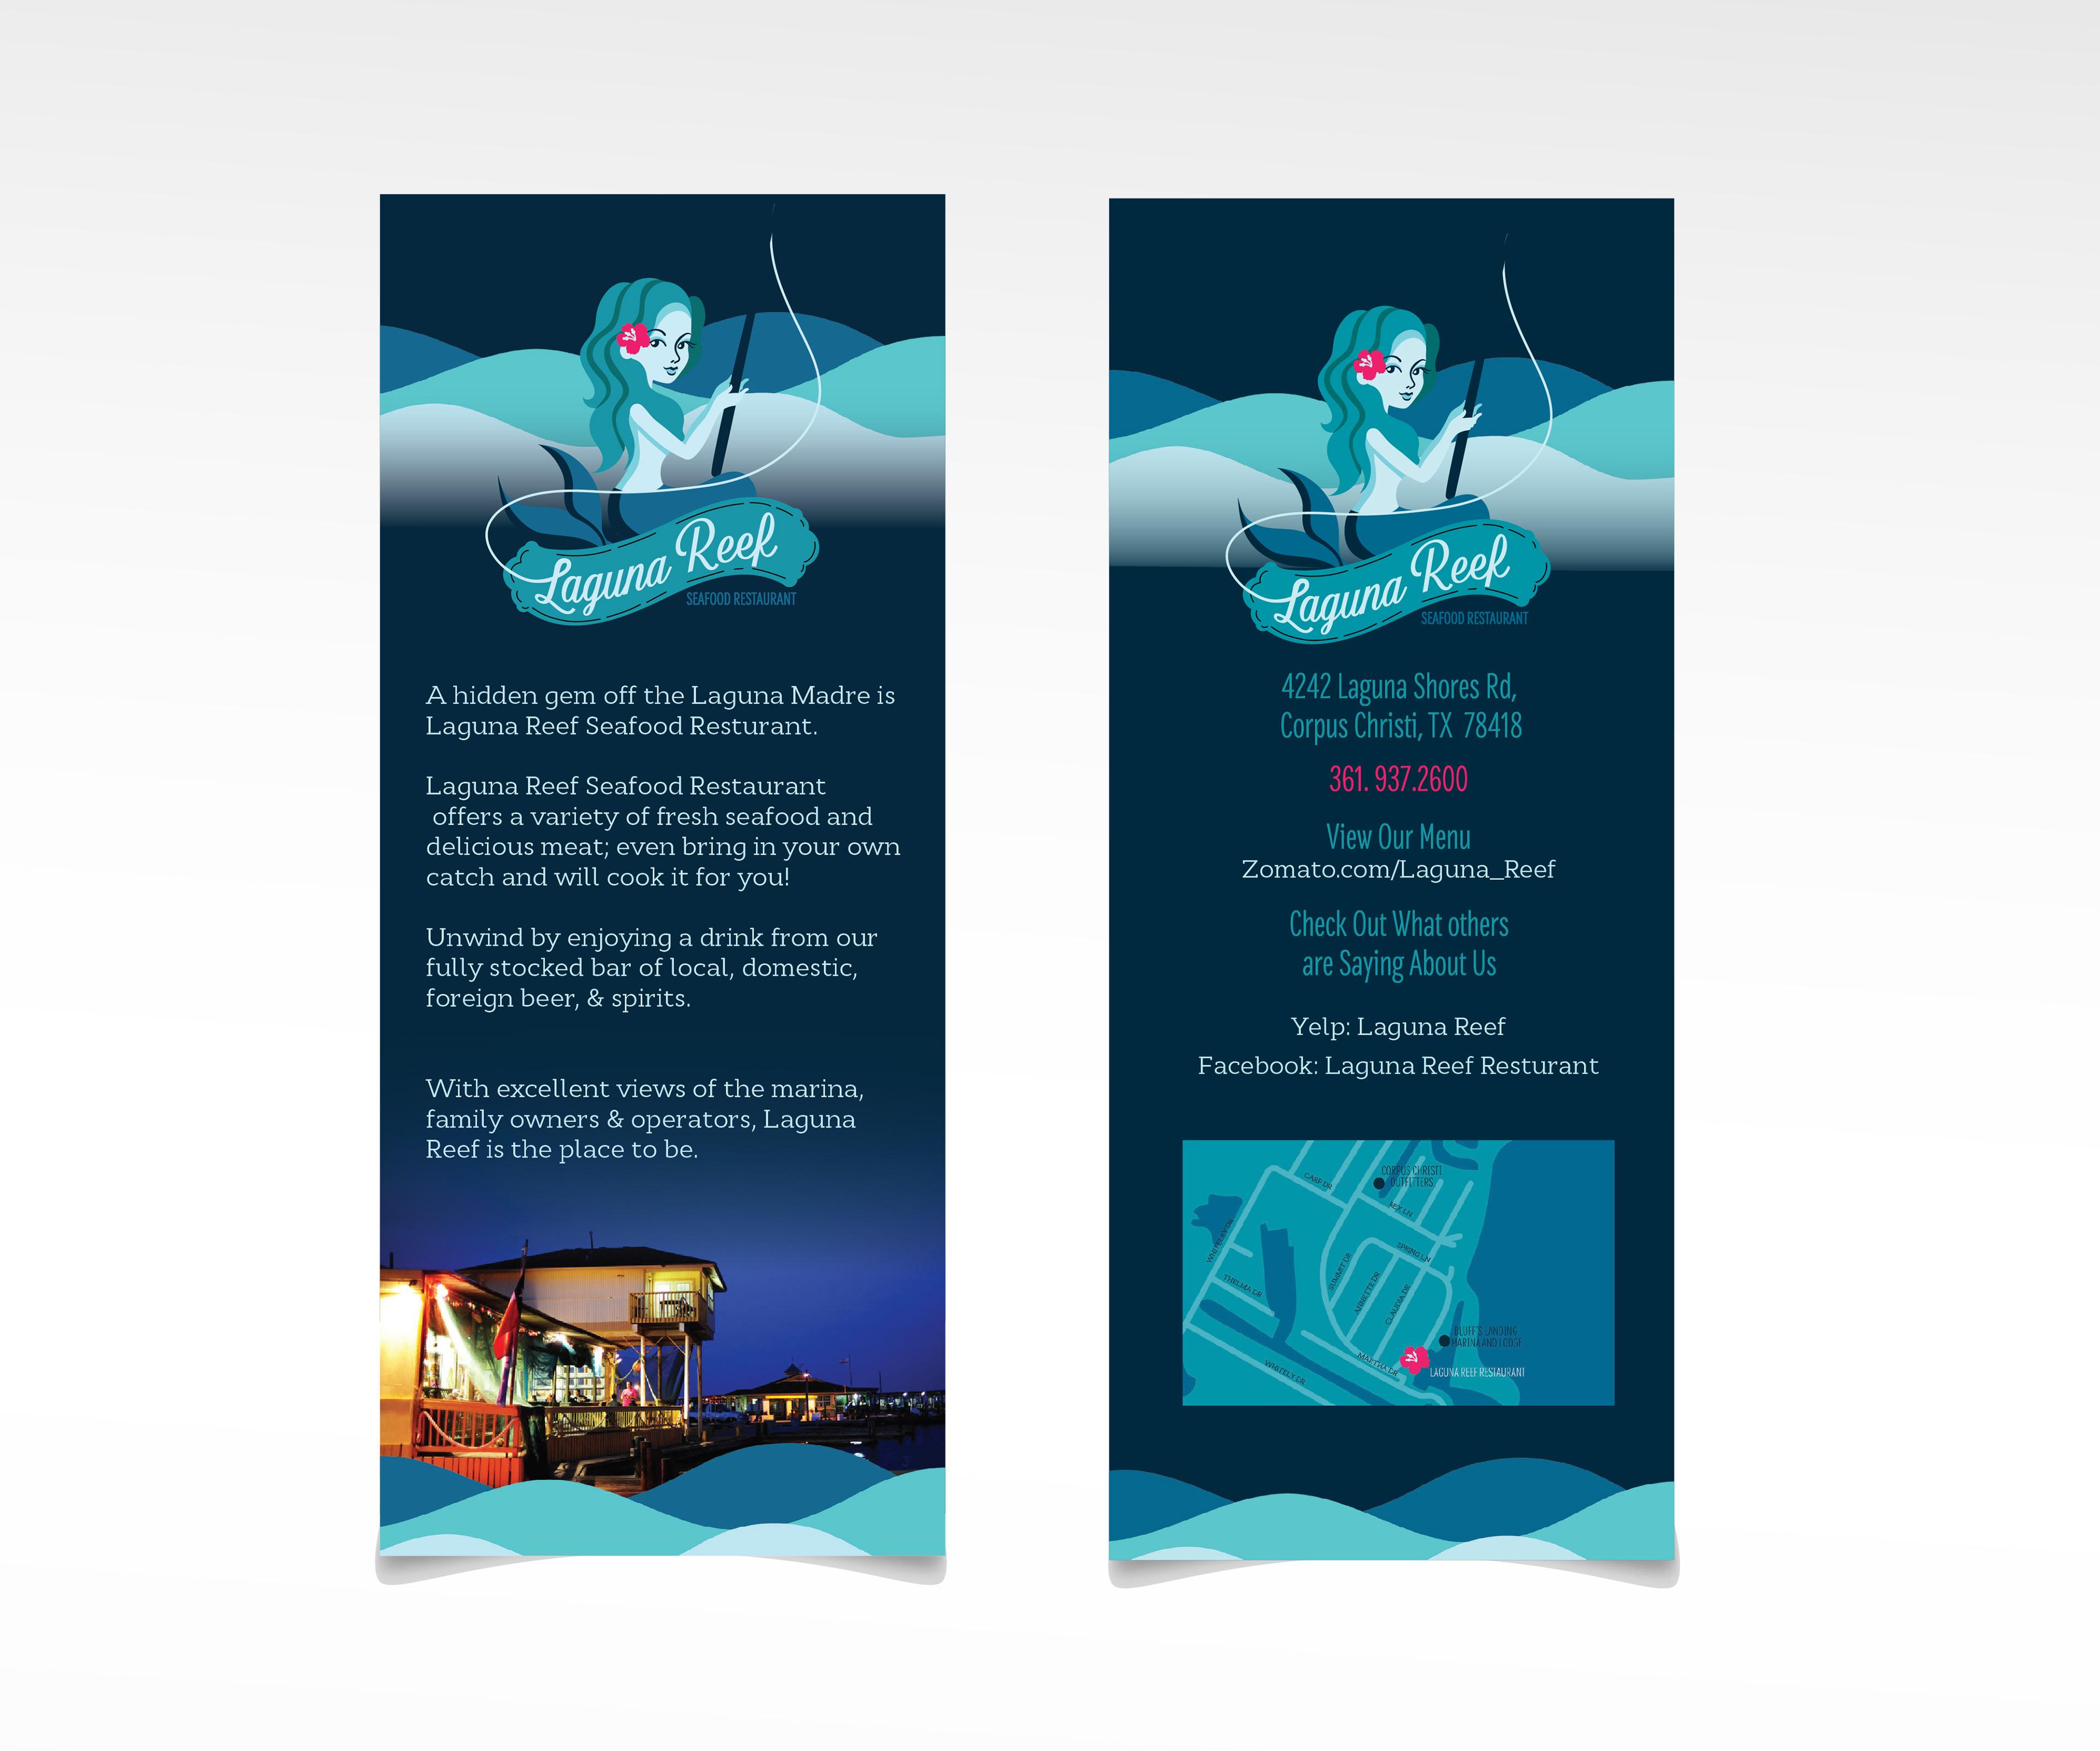 Megan dzhumakeev laguna reef business packet 85x11 letterhead 43x86 envelope 5x5 business card style guide colourmoves